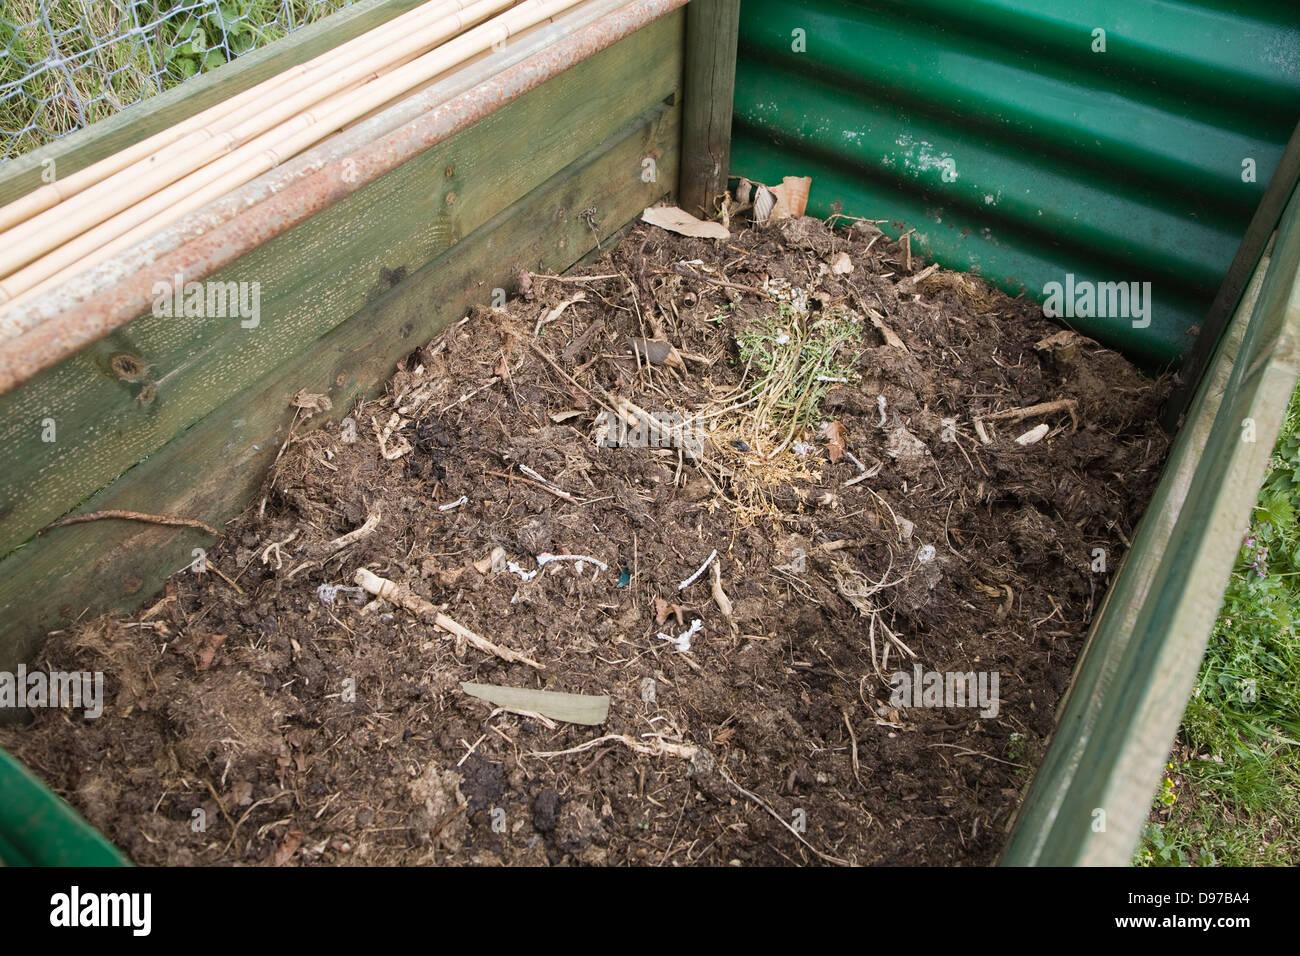 garden compost bin stockfotos garden compost bin bilder alamy. Black Bedroom Furniture Sets. Home Design Ideas